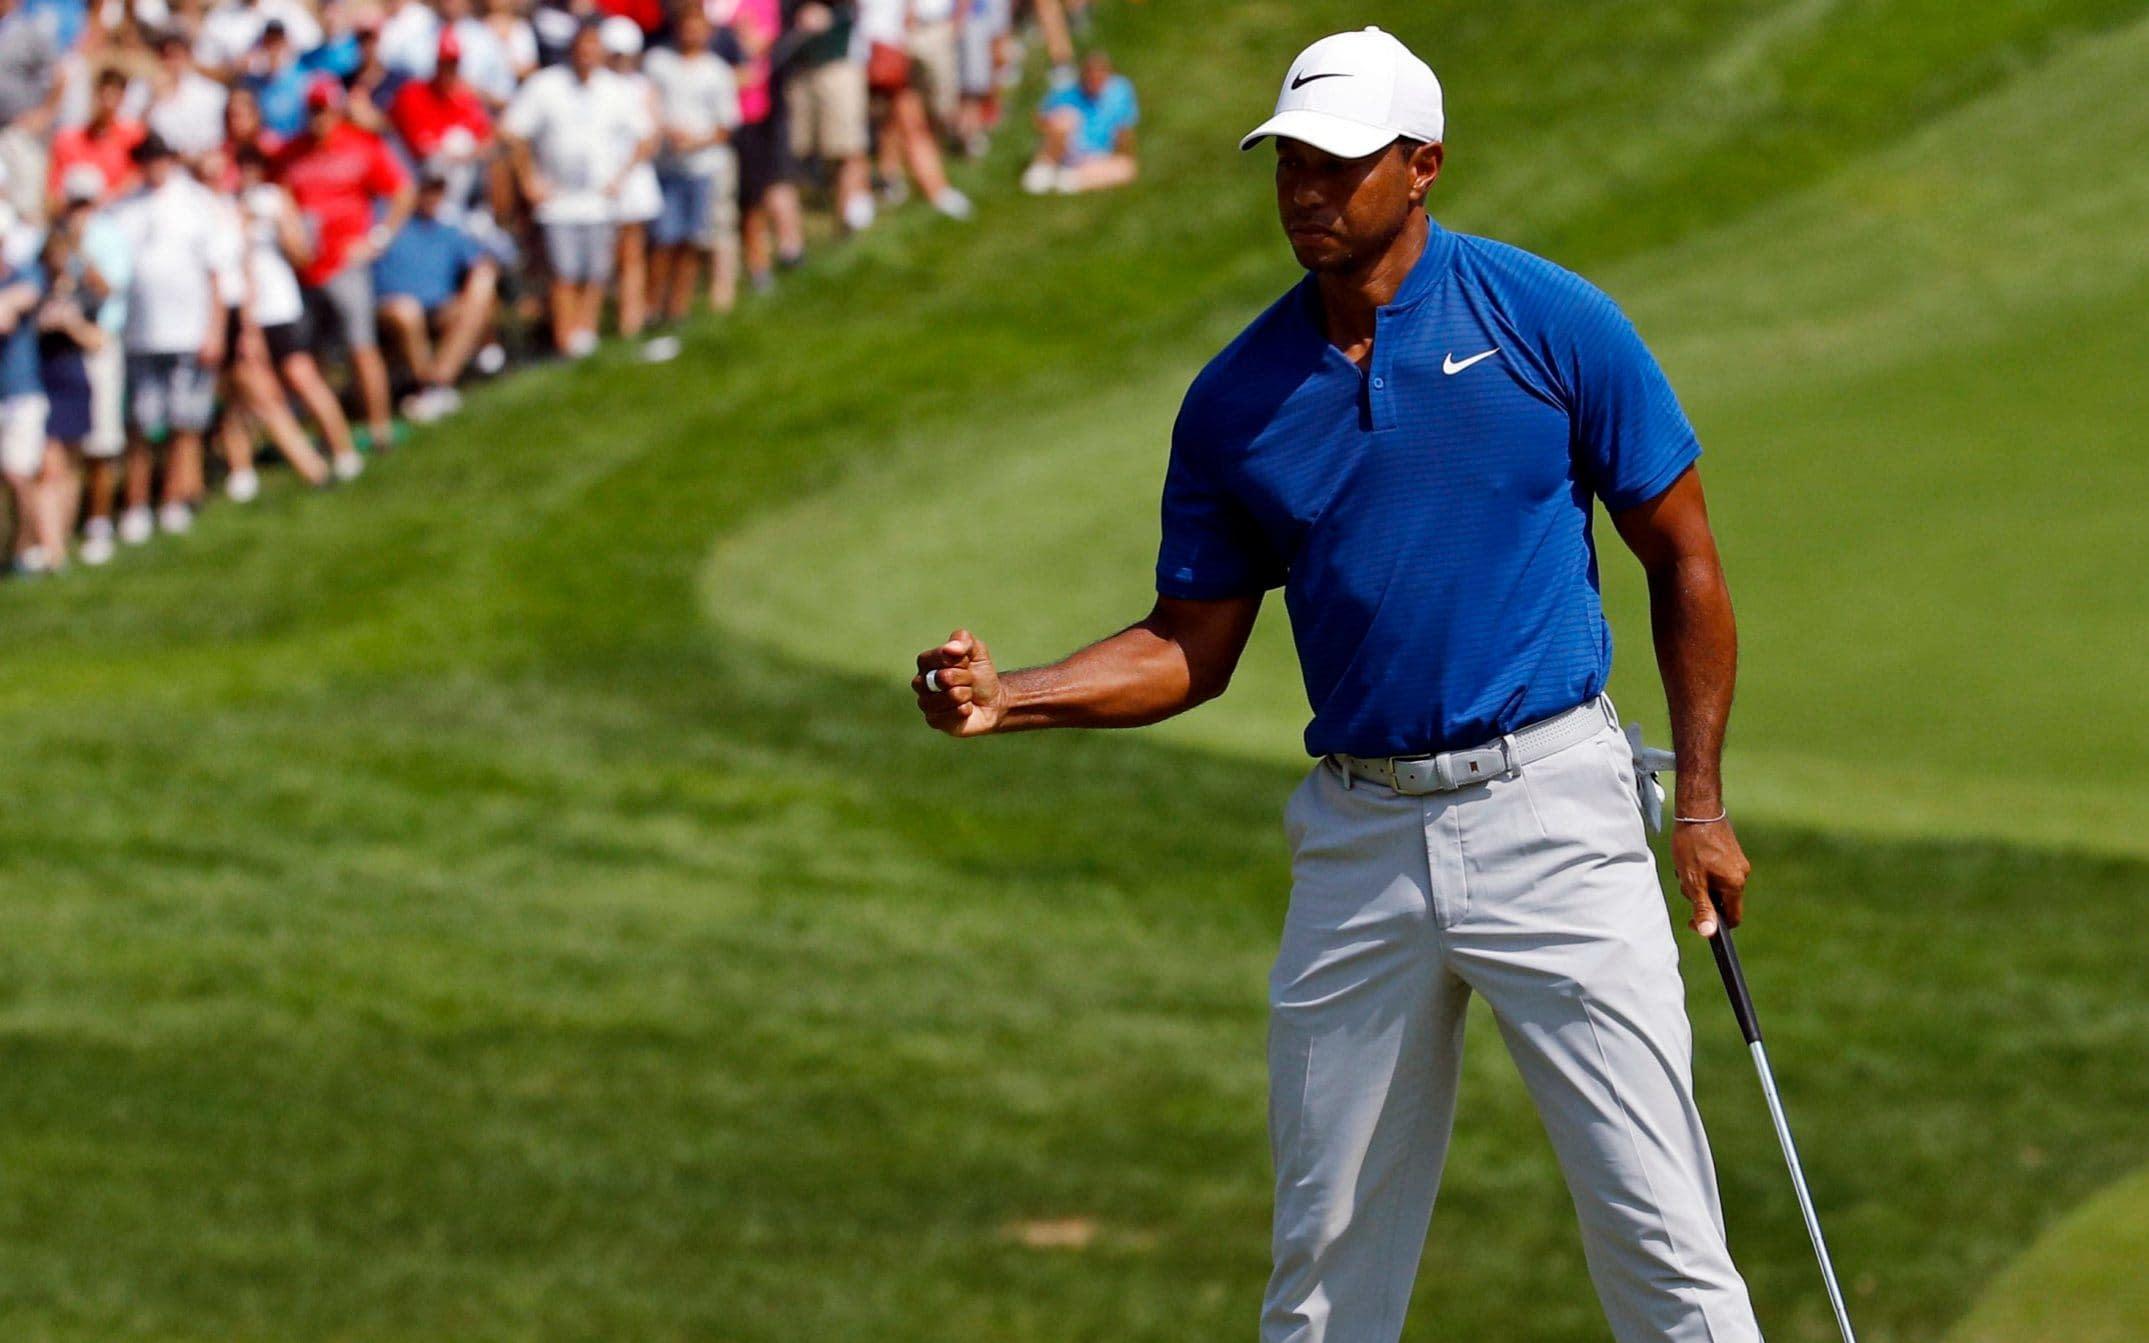 Follow Tiger hole by hole at the PGA Championship Sunday